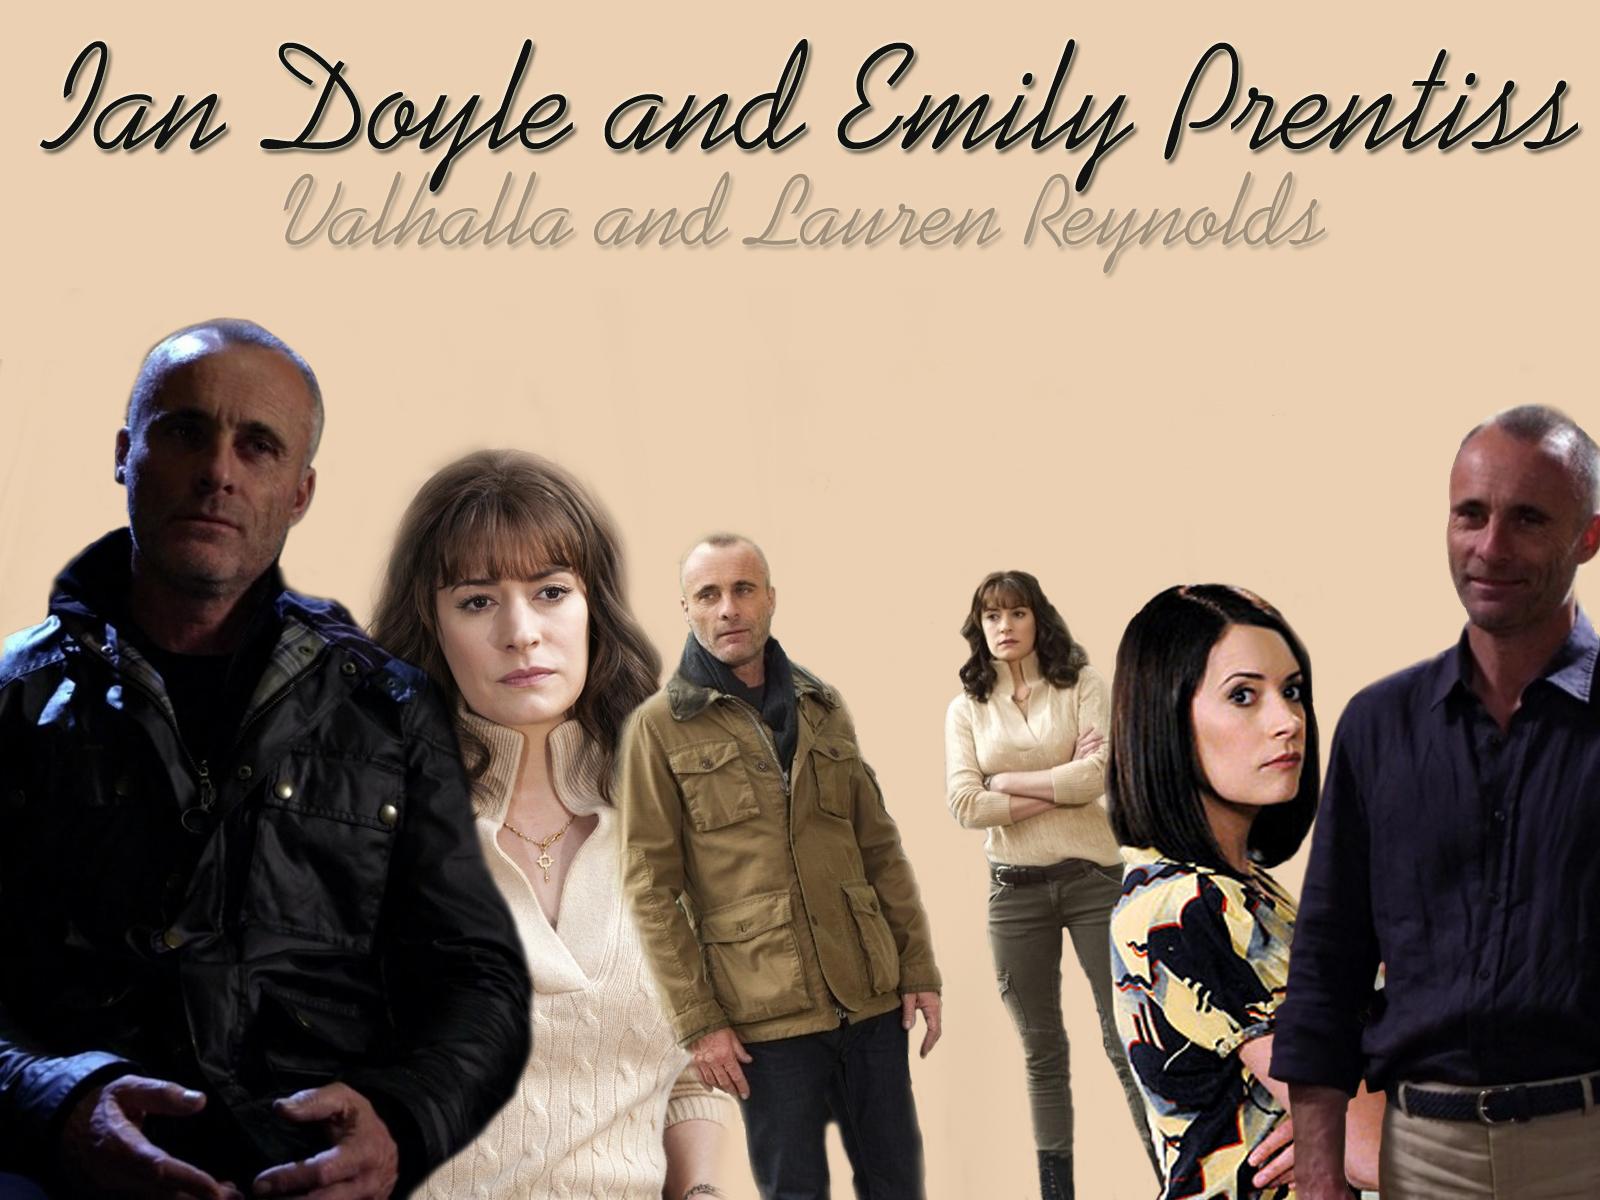 Emily Prentiss and Ian Doyle